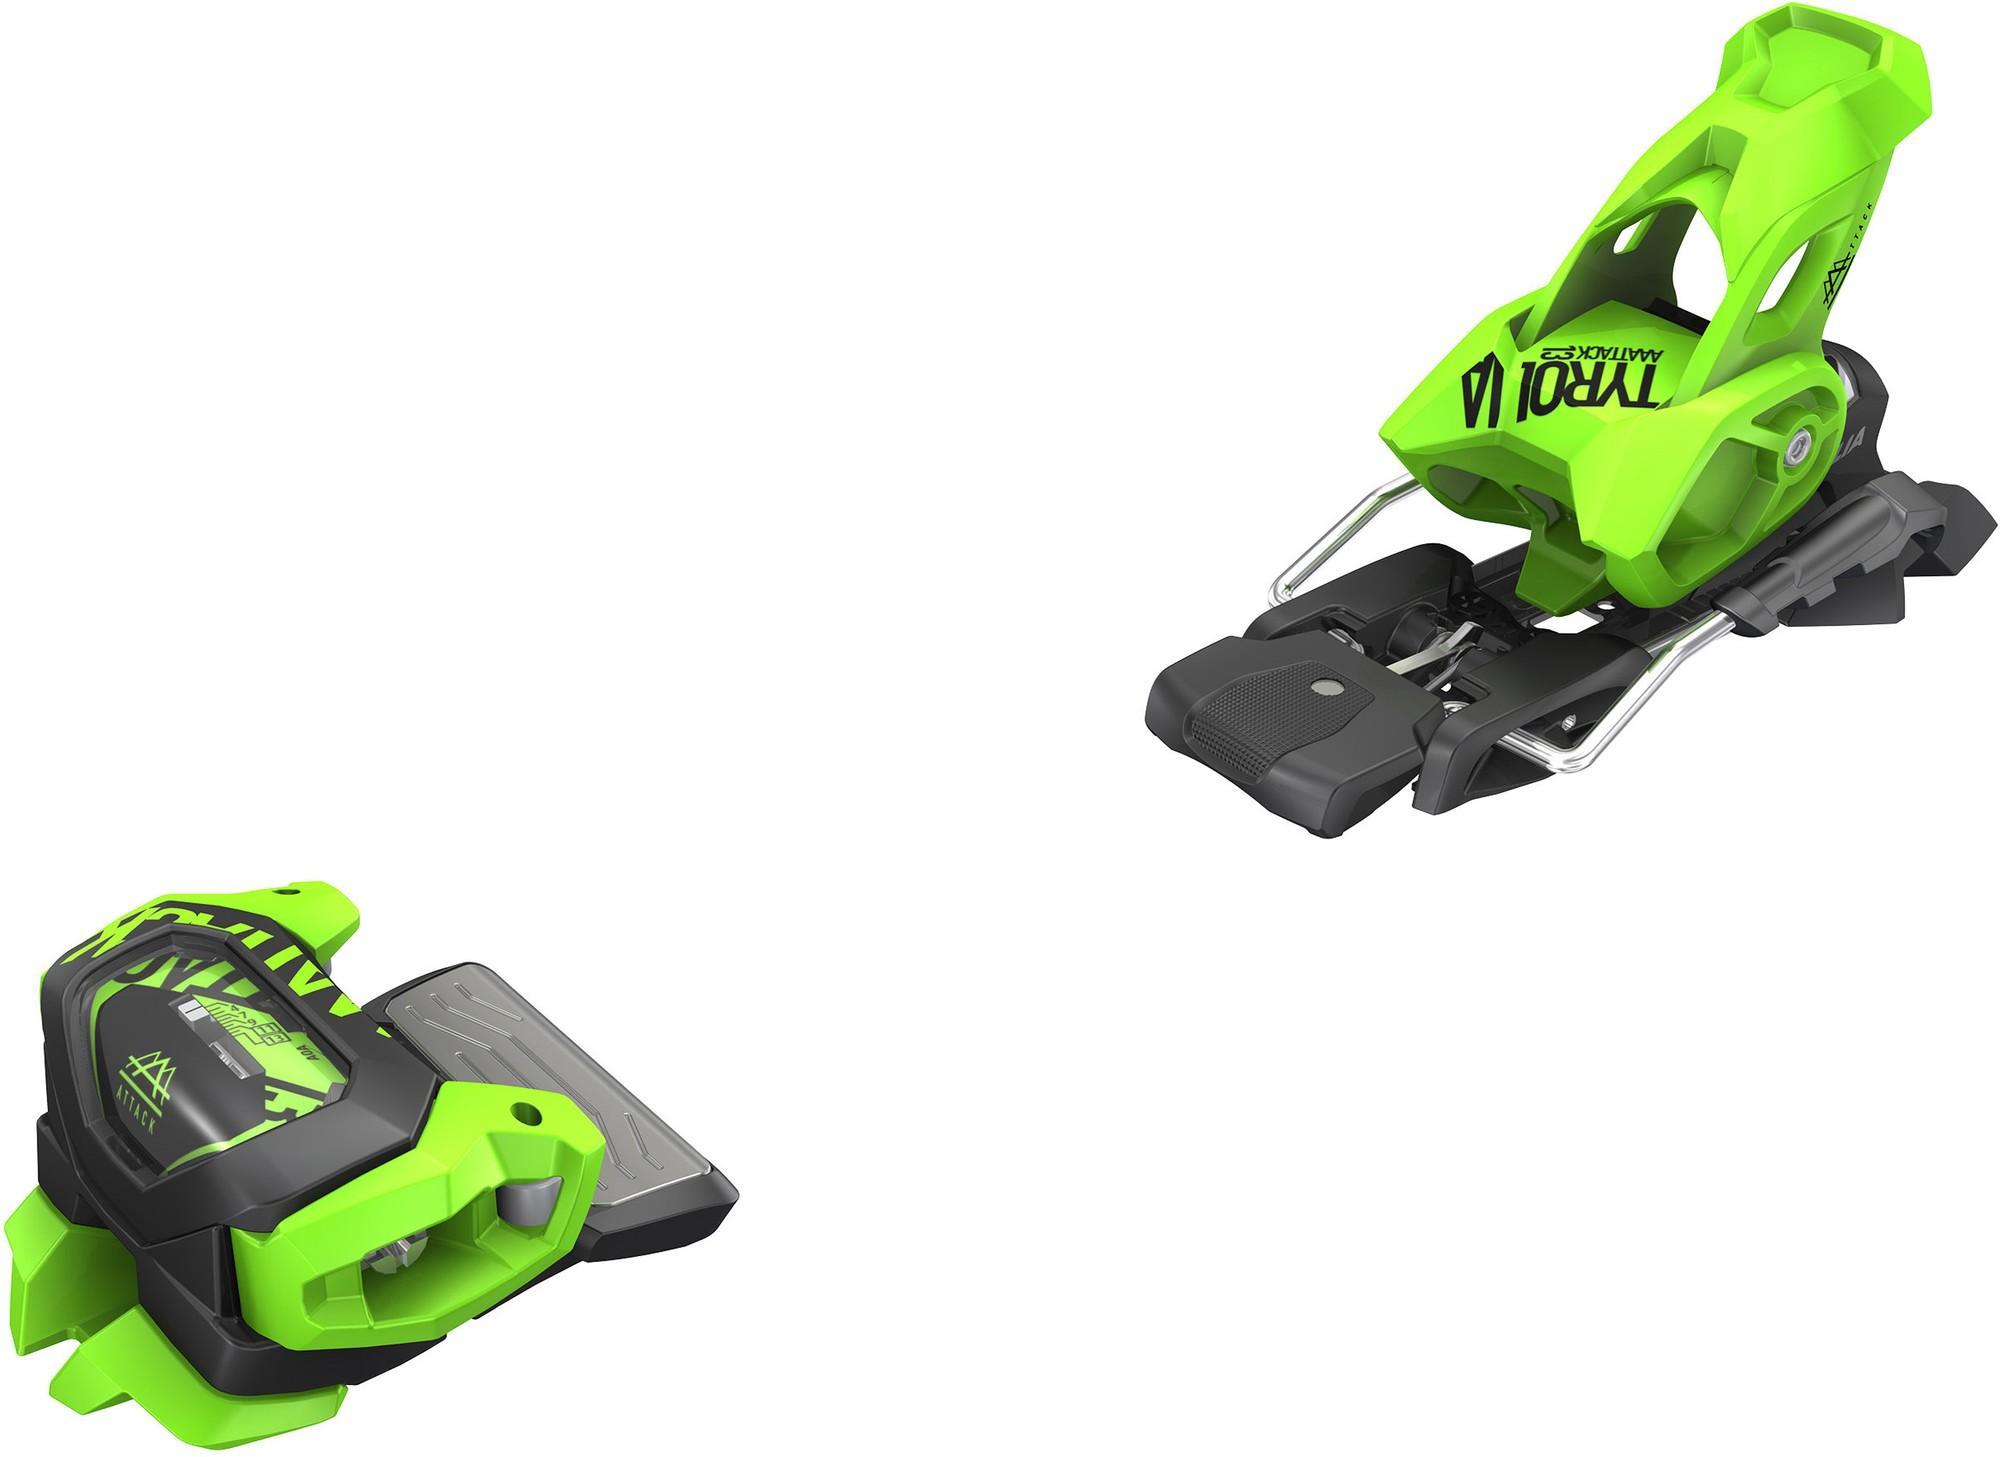 Head Крепления для горных лыж Head ATTACK 13 GW Brake; 110 mm